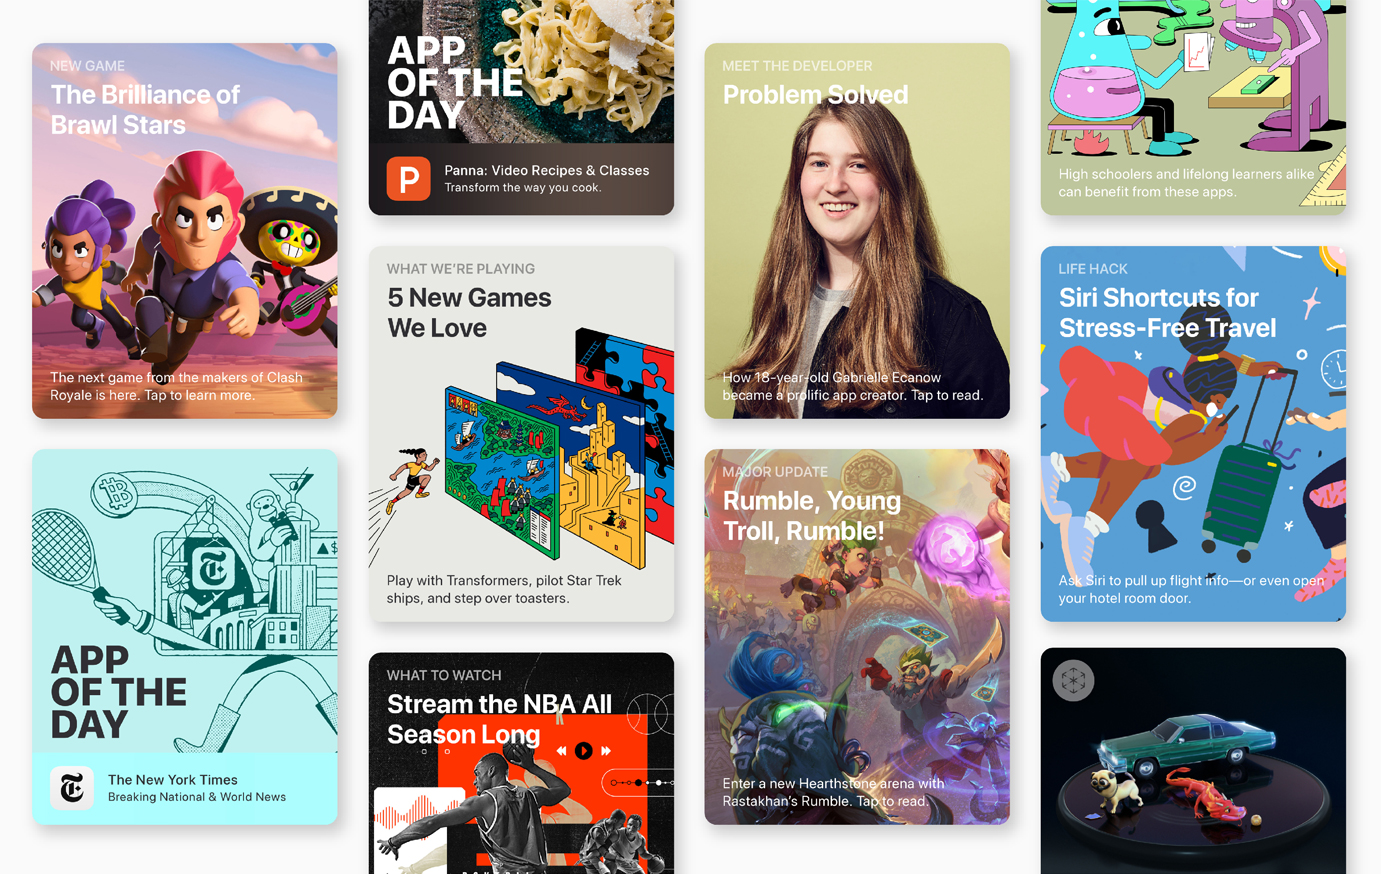 App-Store-caps-record-breaking-2018-with-blockbuster-holiday-week-01032019_big.jpg.medium_2x.jpg